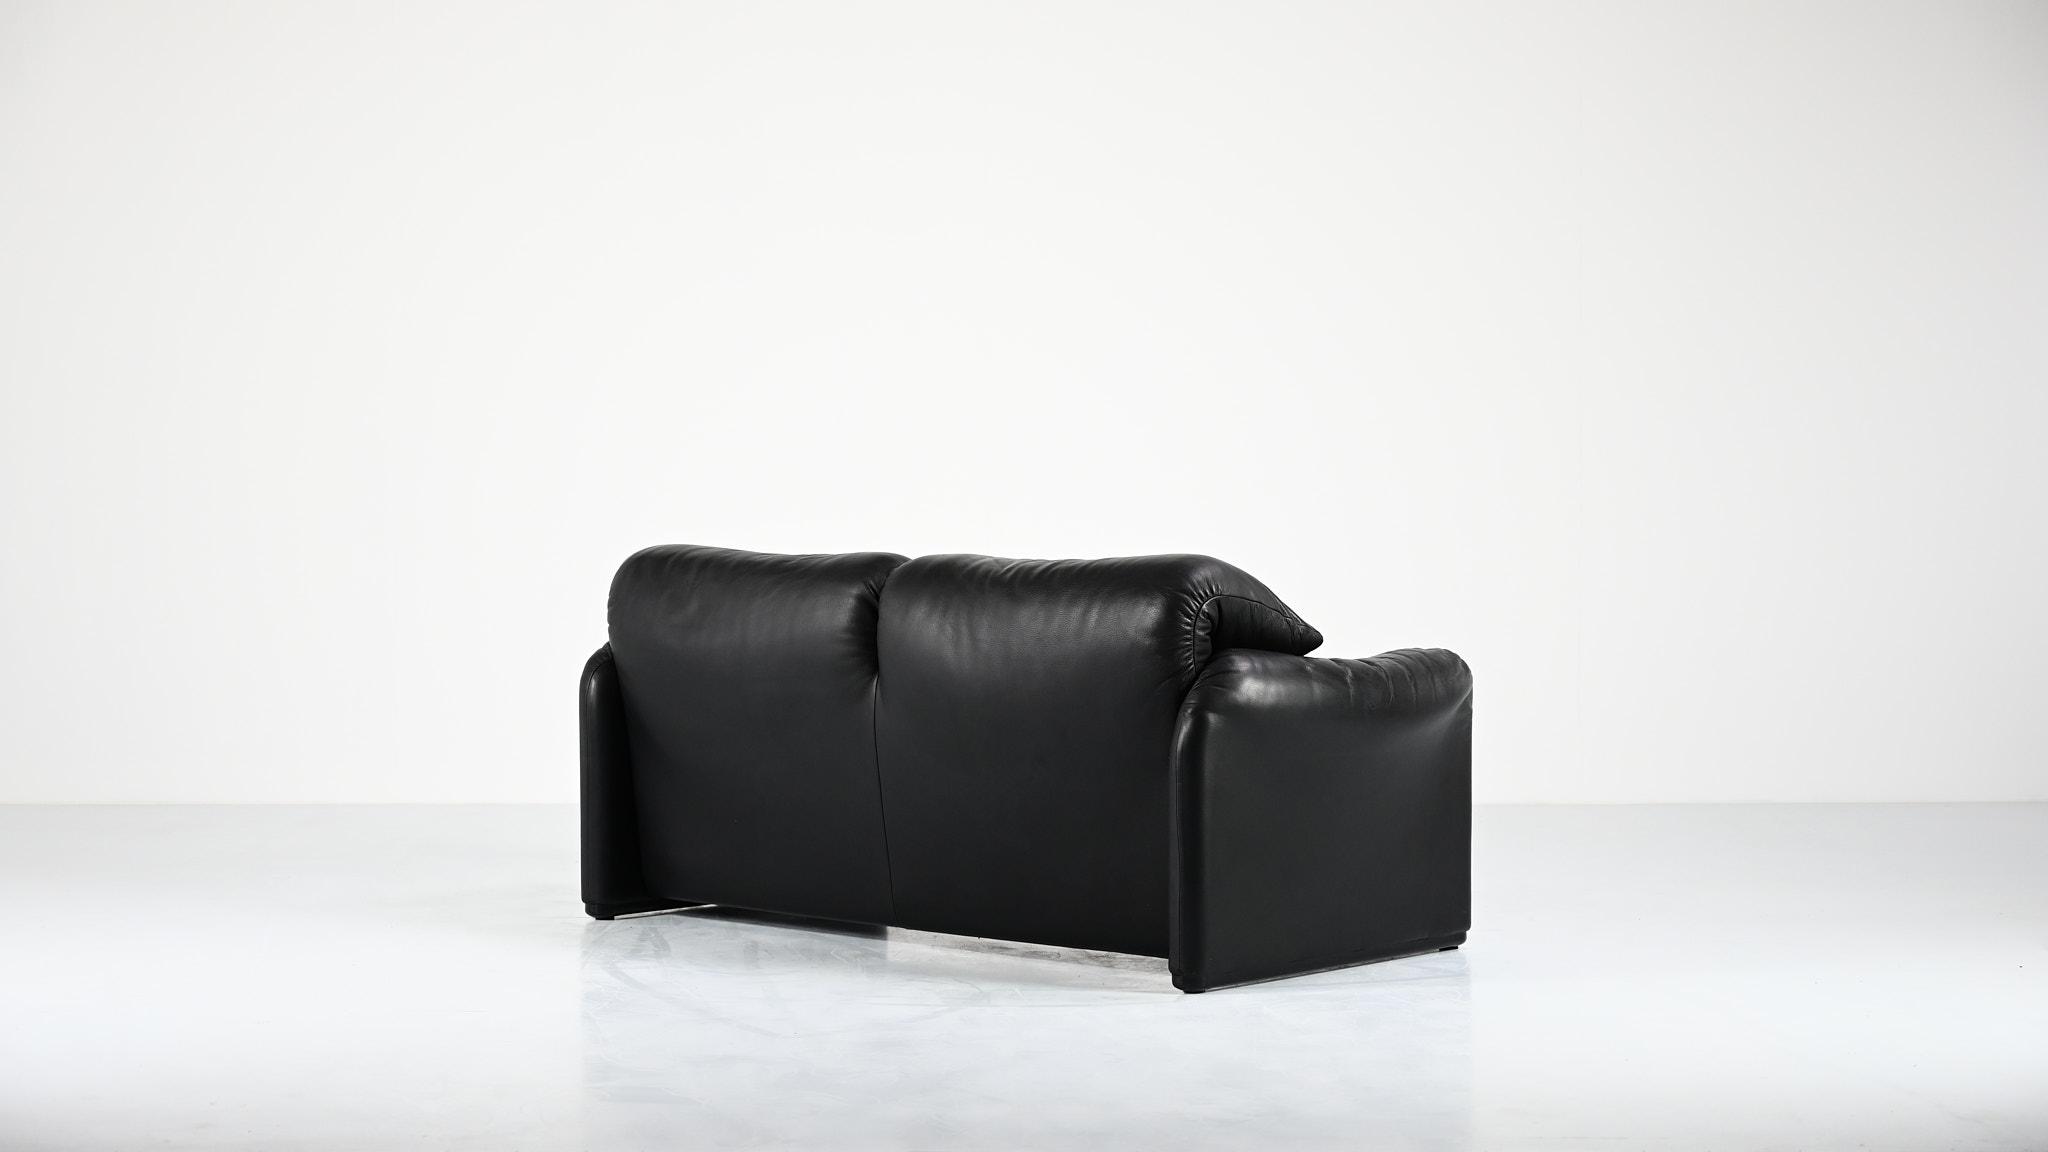 vico magistretti 675 maralunga black leather cuir noir cassina